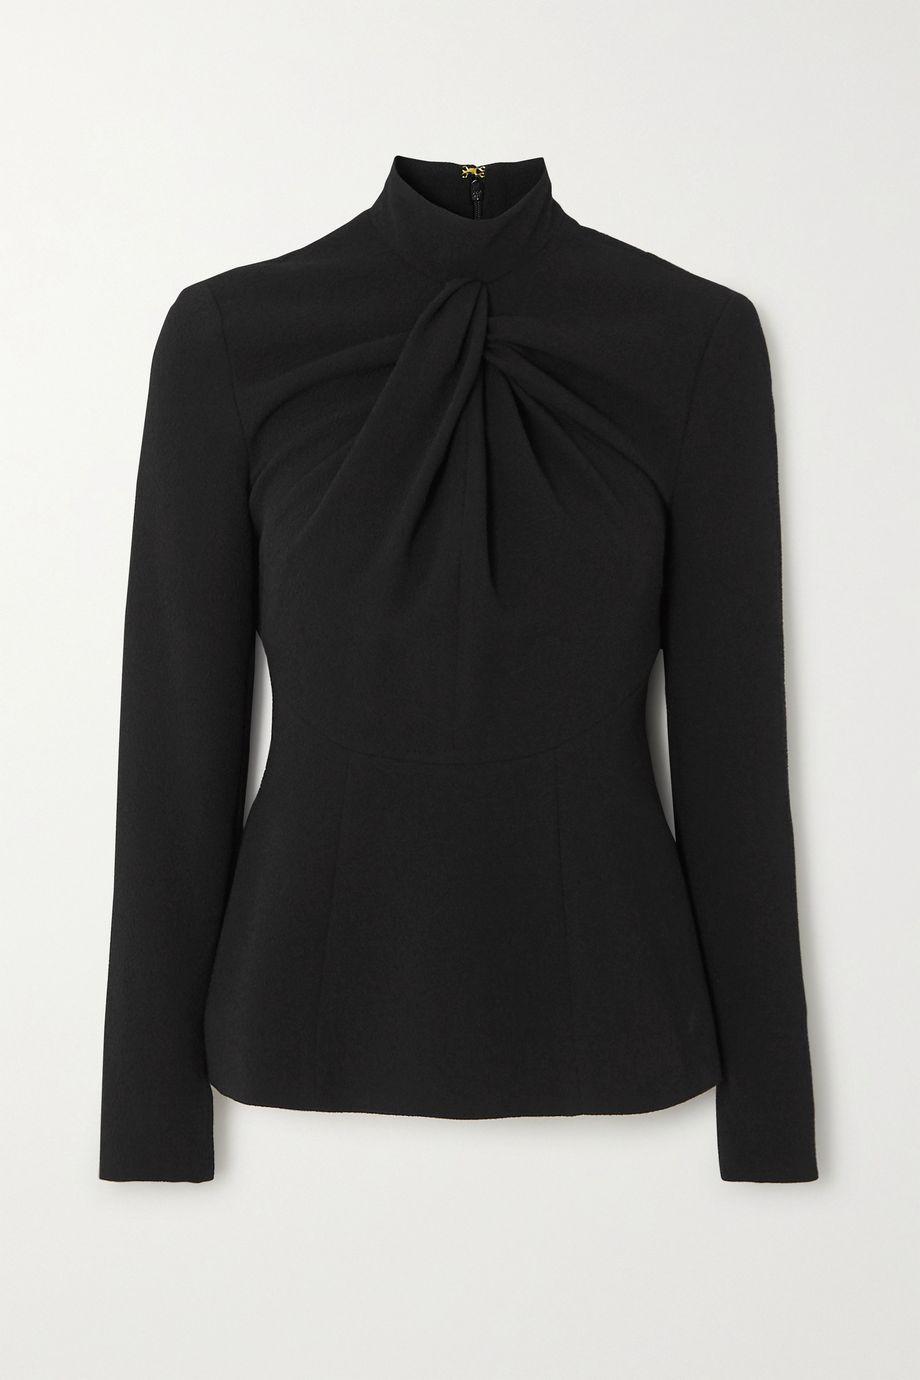 Emilia Wickstead Reina twisted crepe blouse